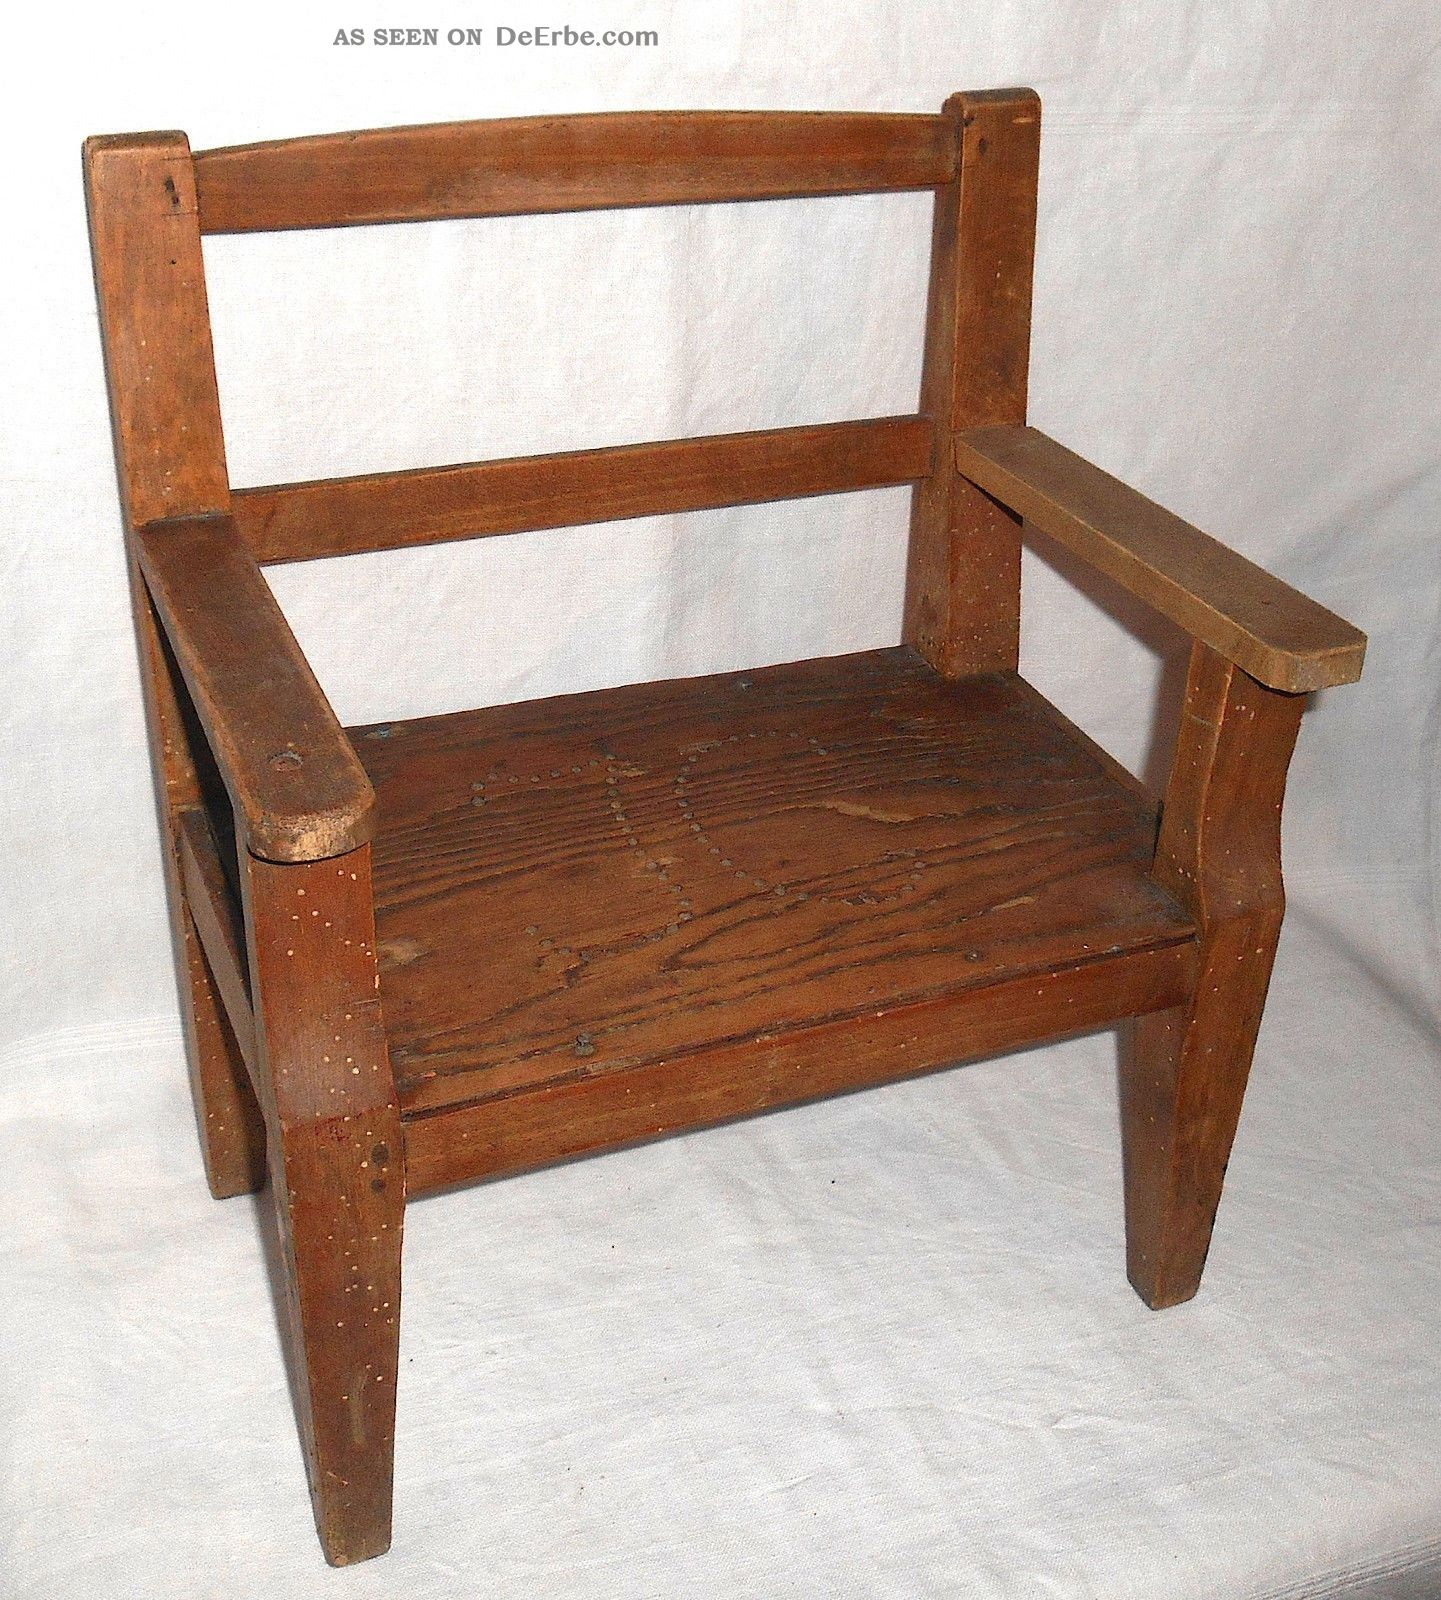 antiker stuhl f r kleinkinder b nckchen evetuell f r den teddyb r 35 cm lang. Black Bedroom Furniture Sets. Home Design Ideas